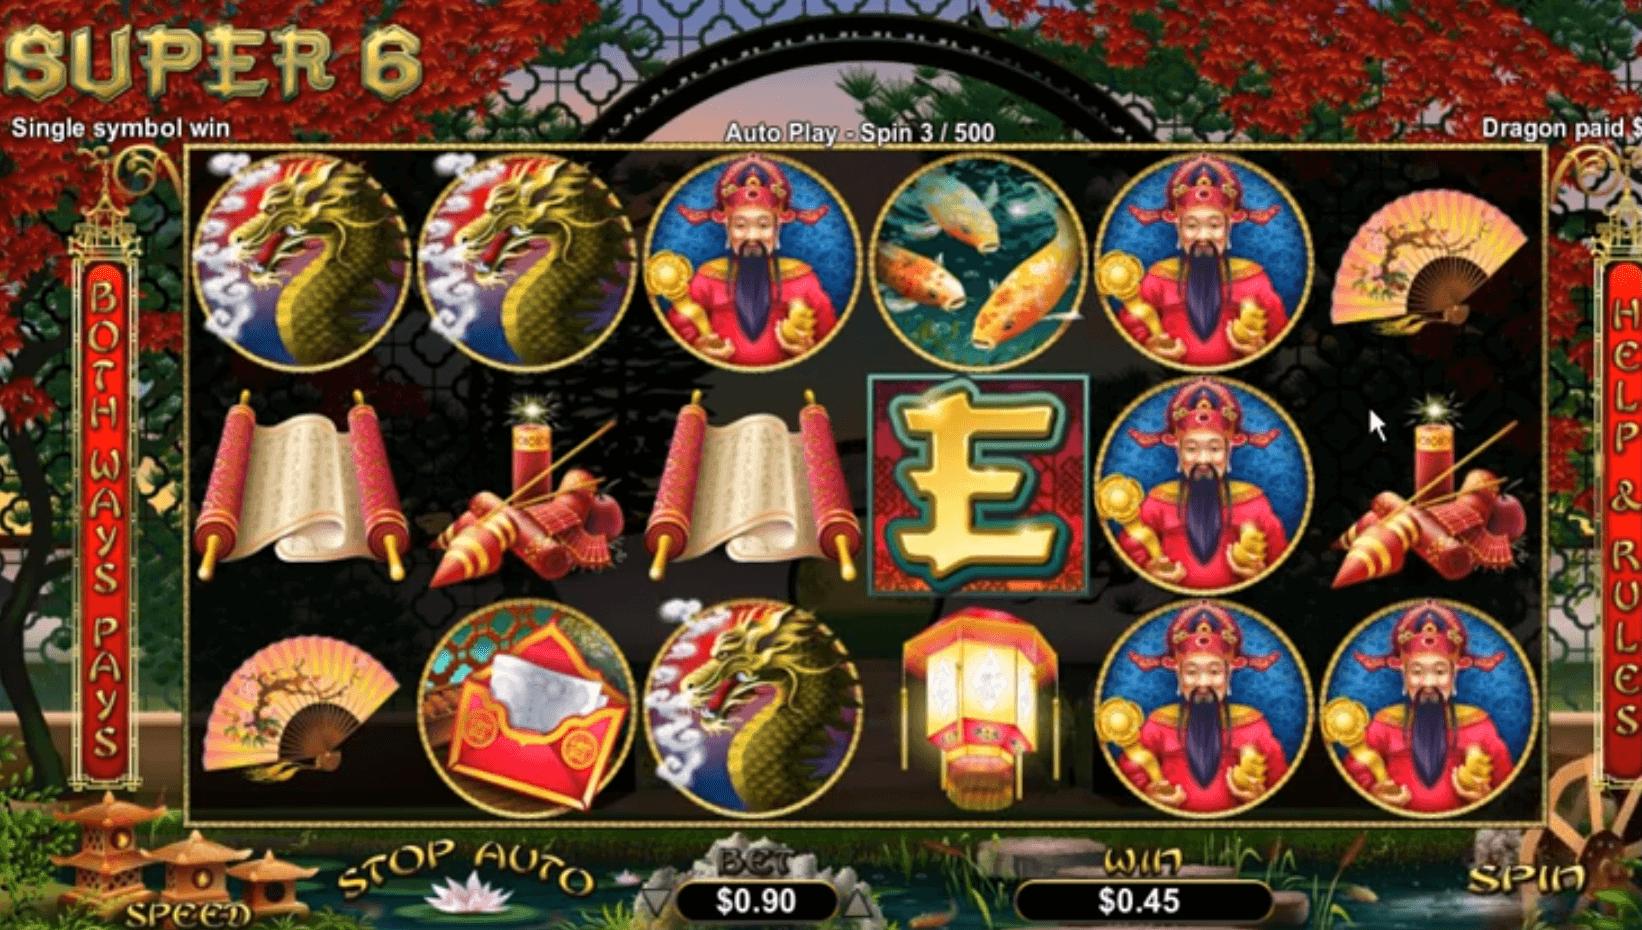 Spiele Super 6 - Video Slots Online